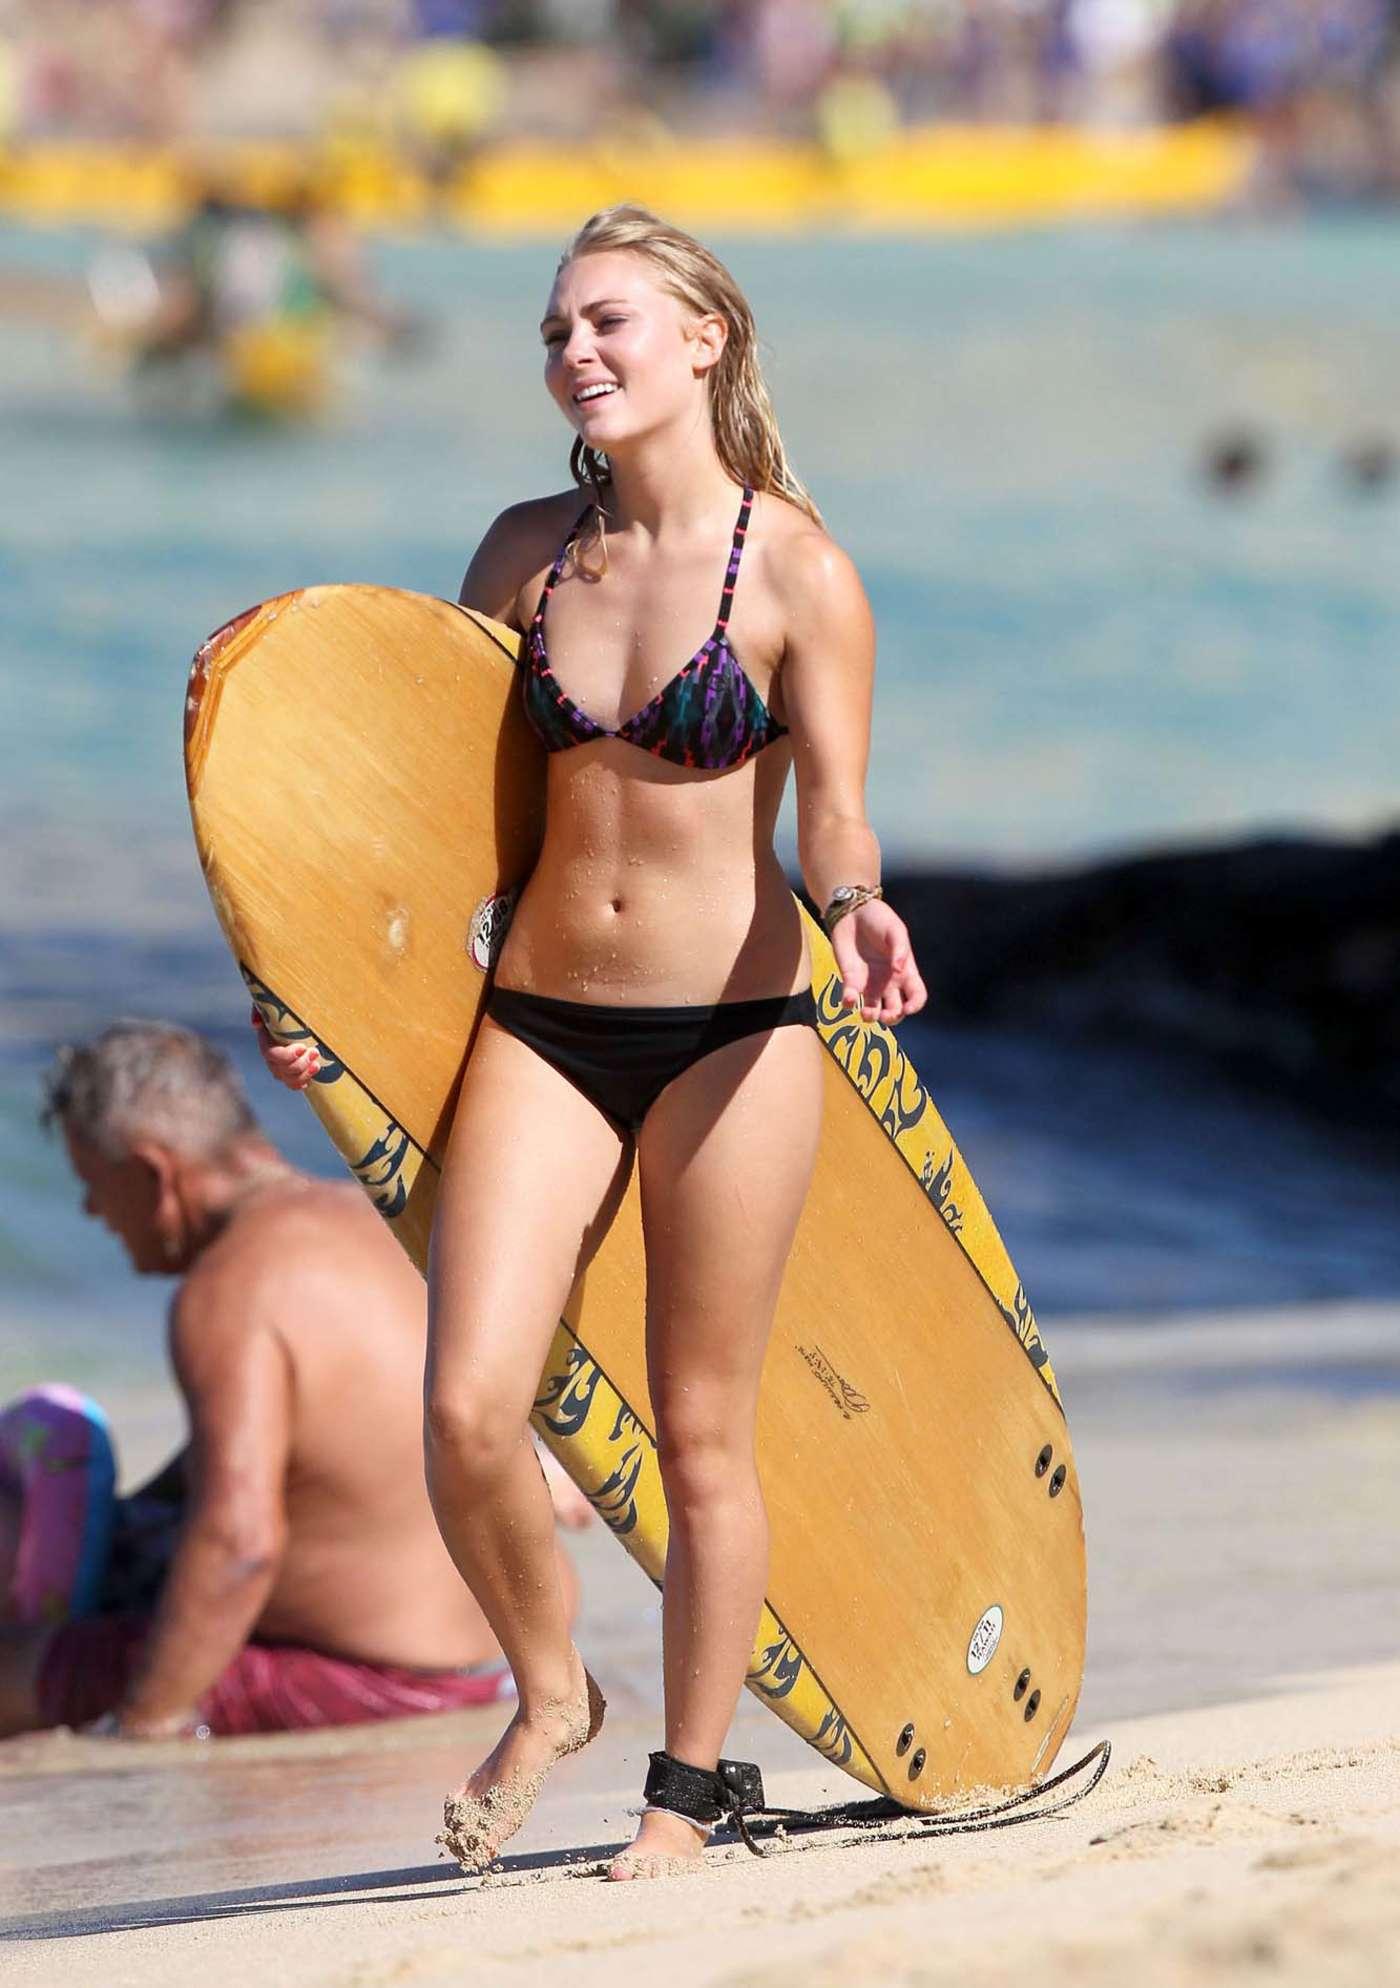 AnnaSophia Robb in Bikini Paddleboarding -04 - GotCeleb